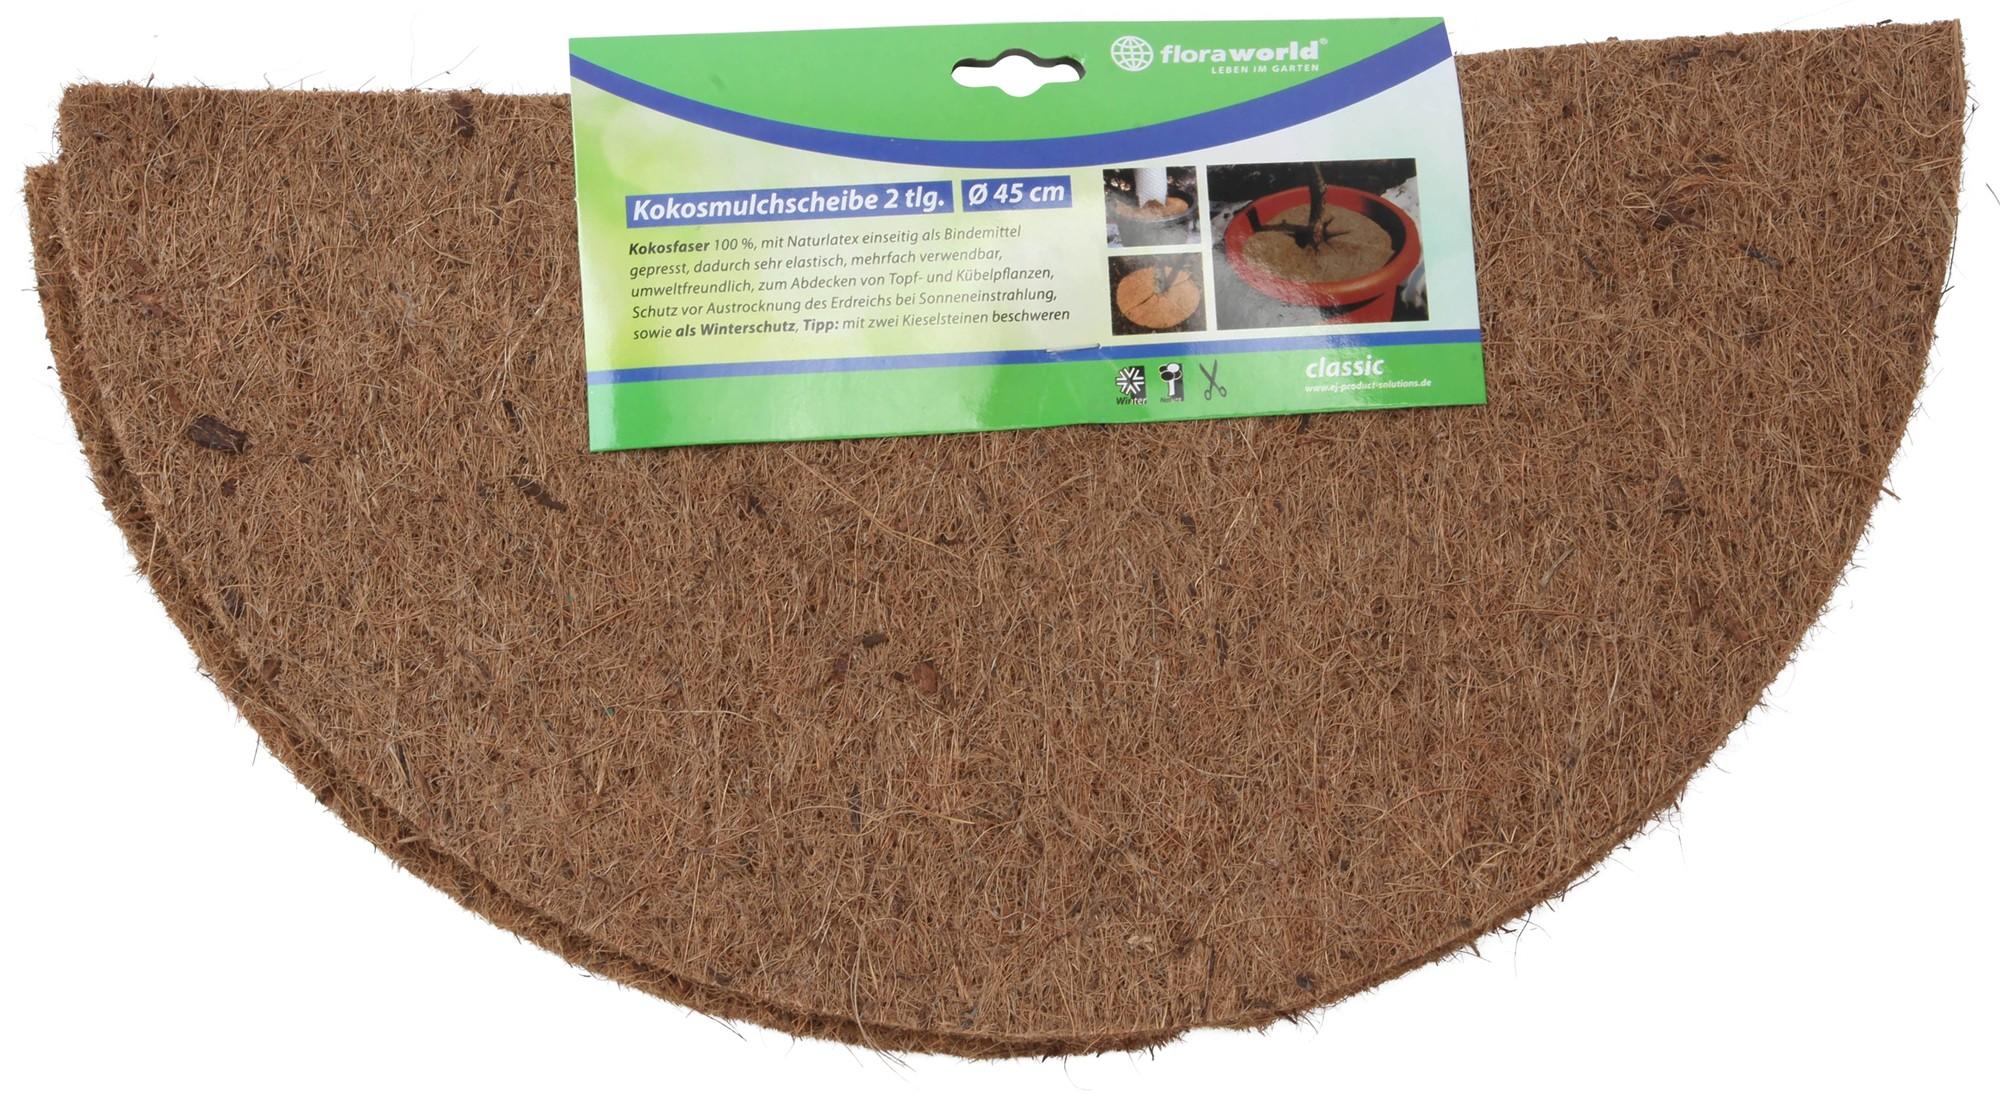 mulchscheibe cocodisc kokos natur 45cm bei. Black Bedroom Furniture Sets. Home Design Ideas